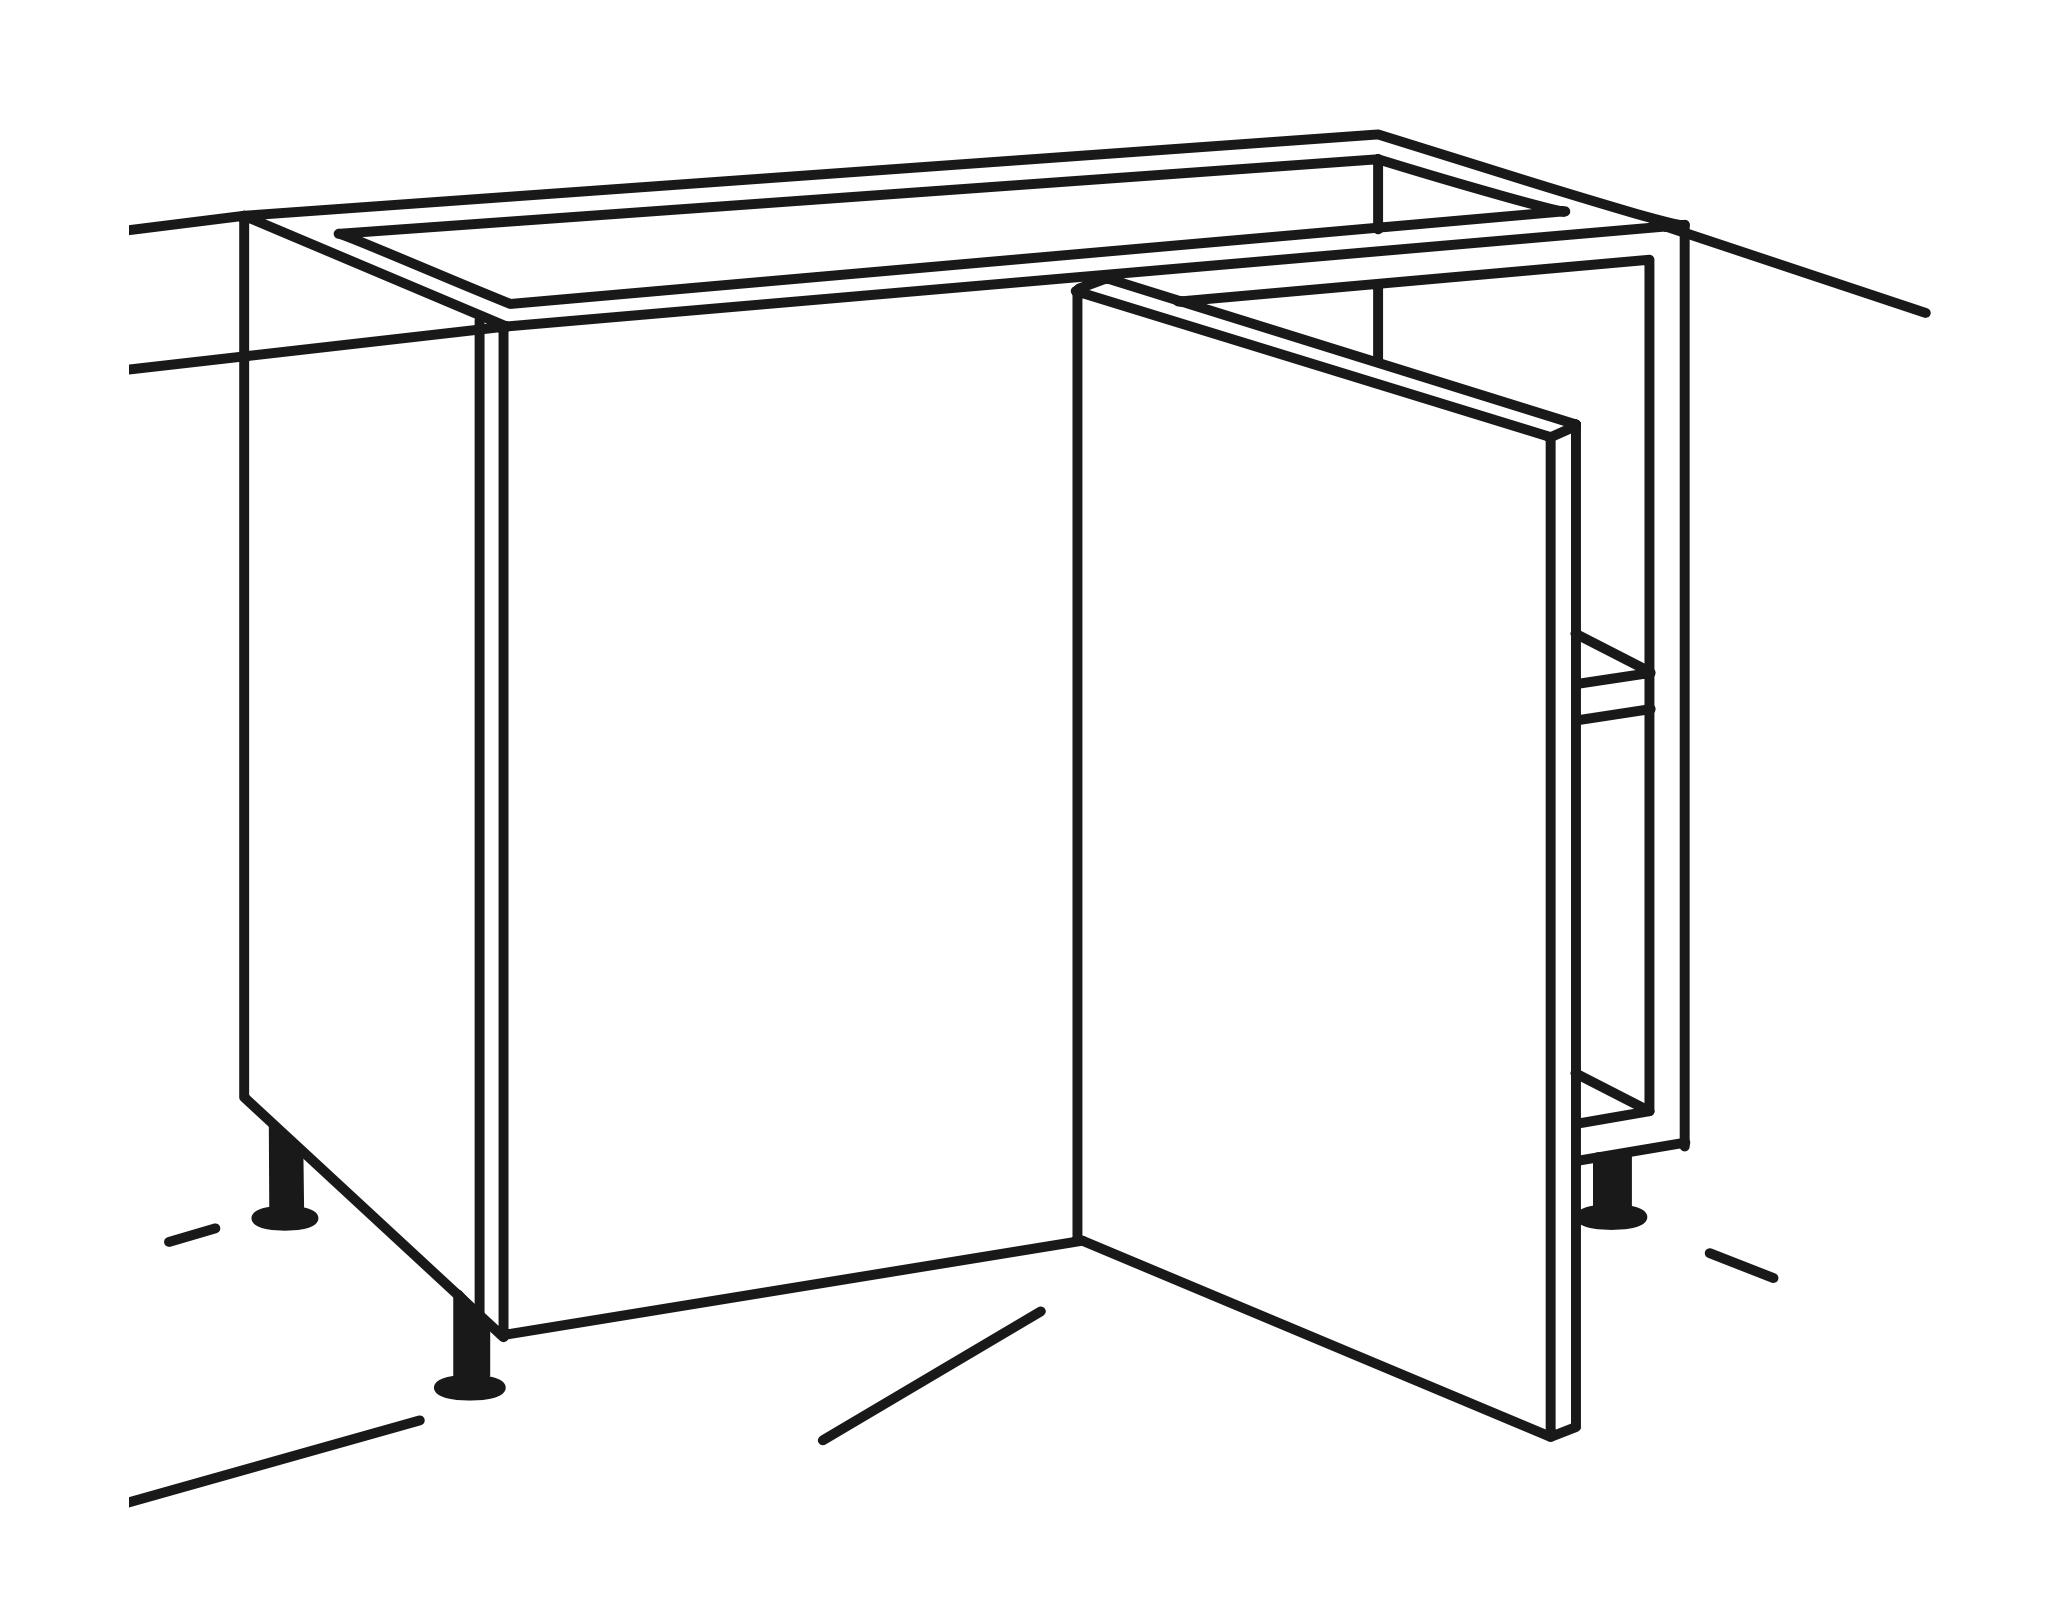 Für Eckunterschrank UEL116-8 | UEL106-7 | UEL116-3D